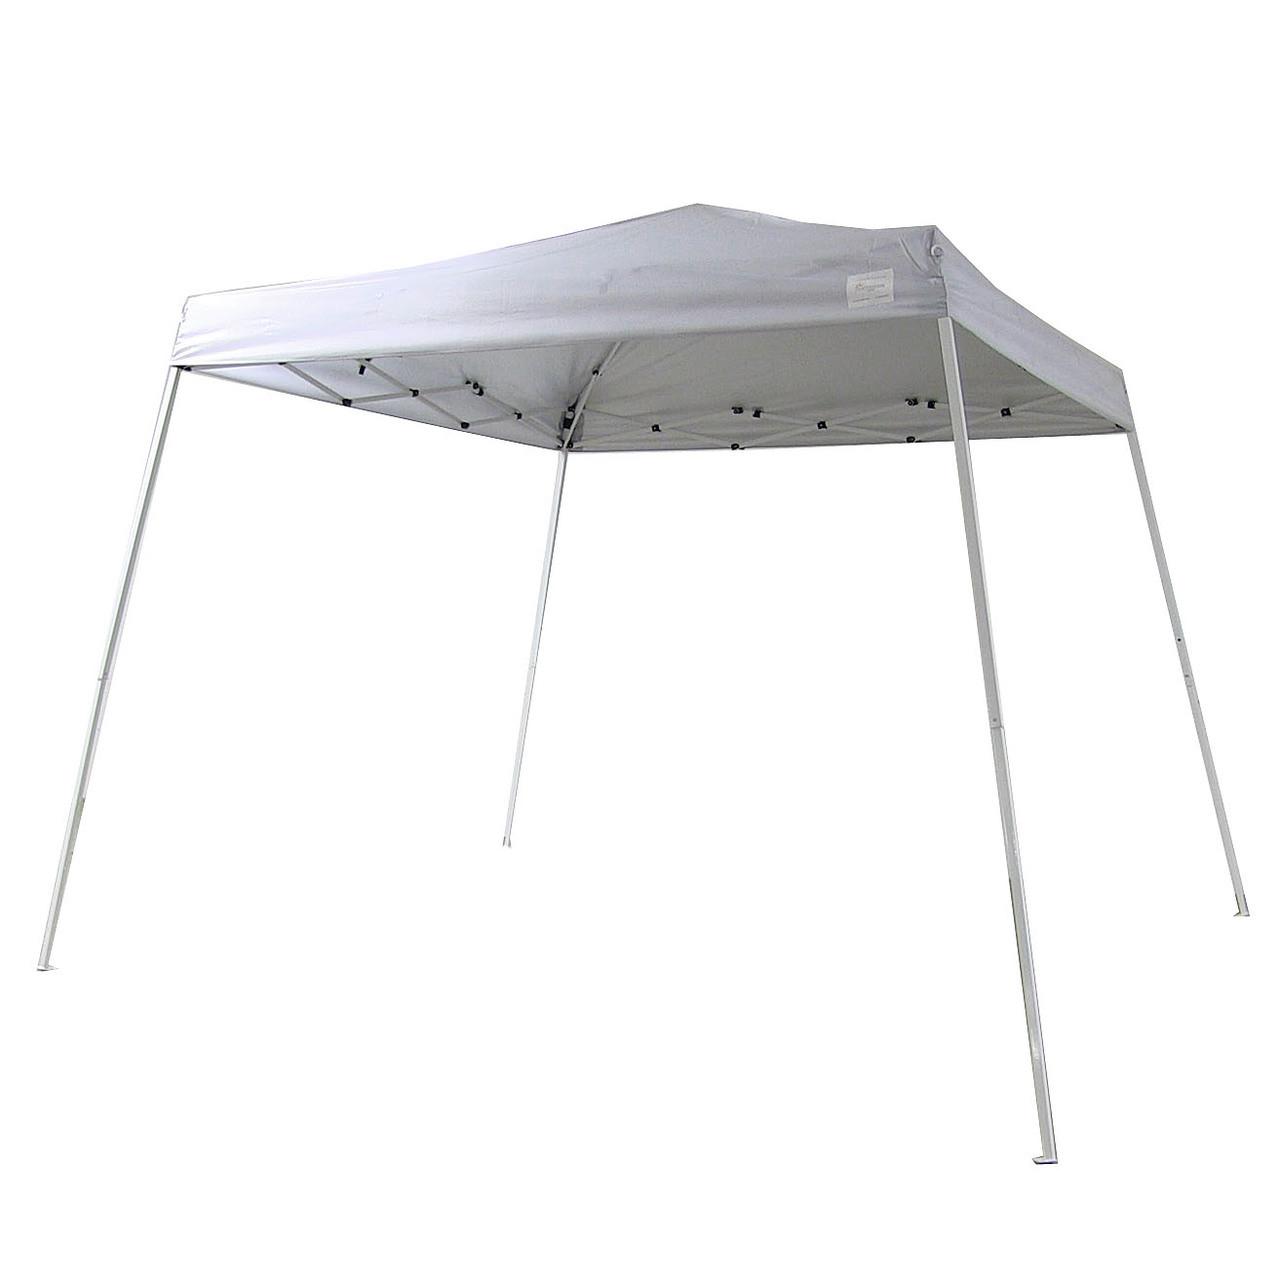 Navy Canopy; White Canopy ...  sc 1 st  Serenity Health & Sunnydaze Quick-Up 8u0027 x 8u0027 Top 10u0027 x 10u0027 Ground Slant Leg Canopy ...